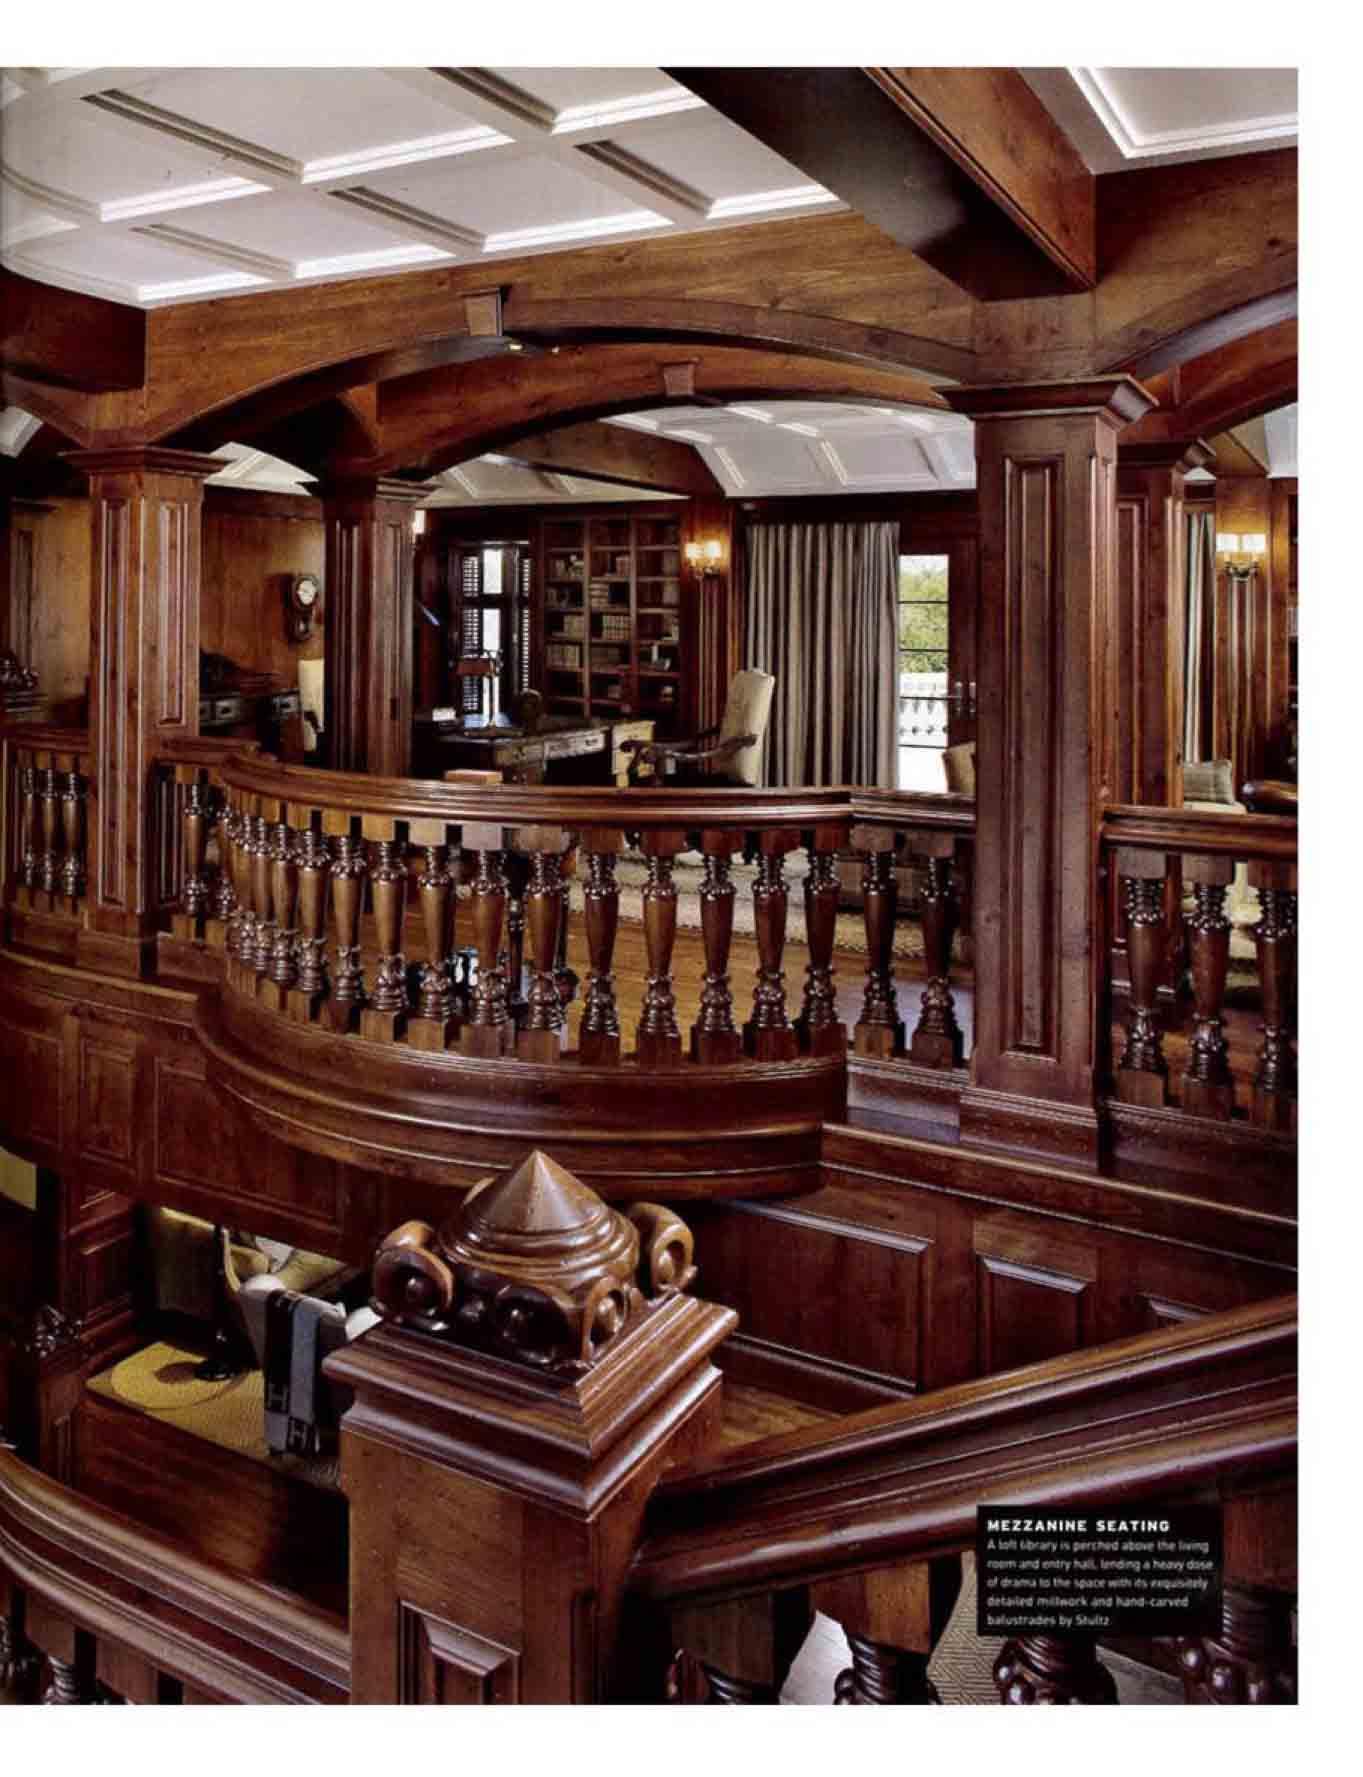 14 mezzanine seating 72.jpg